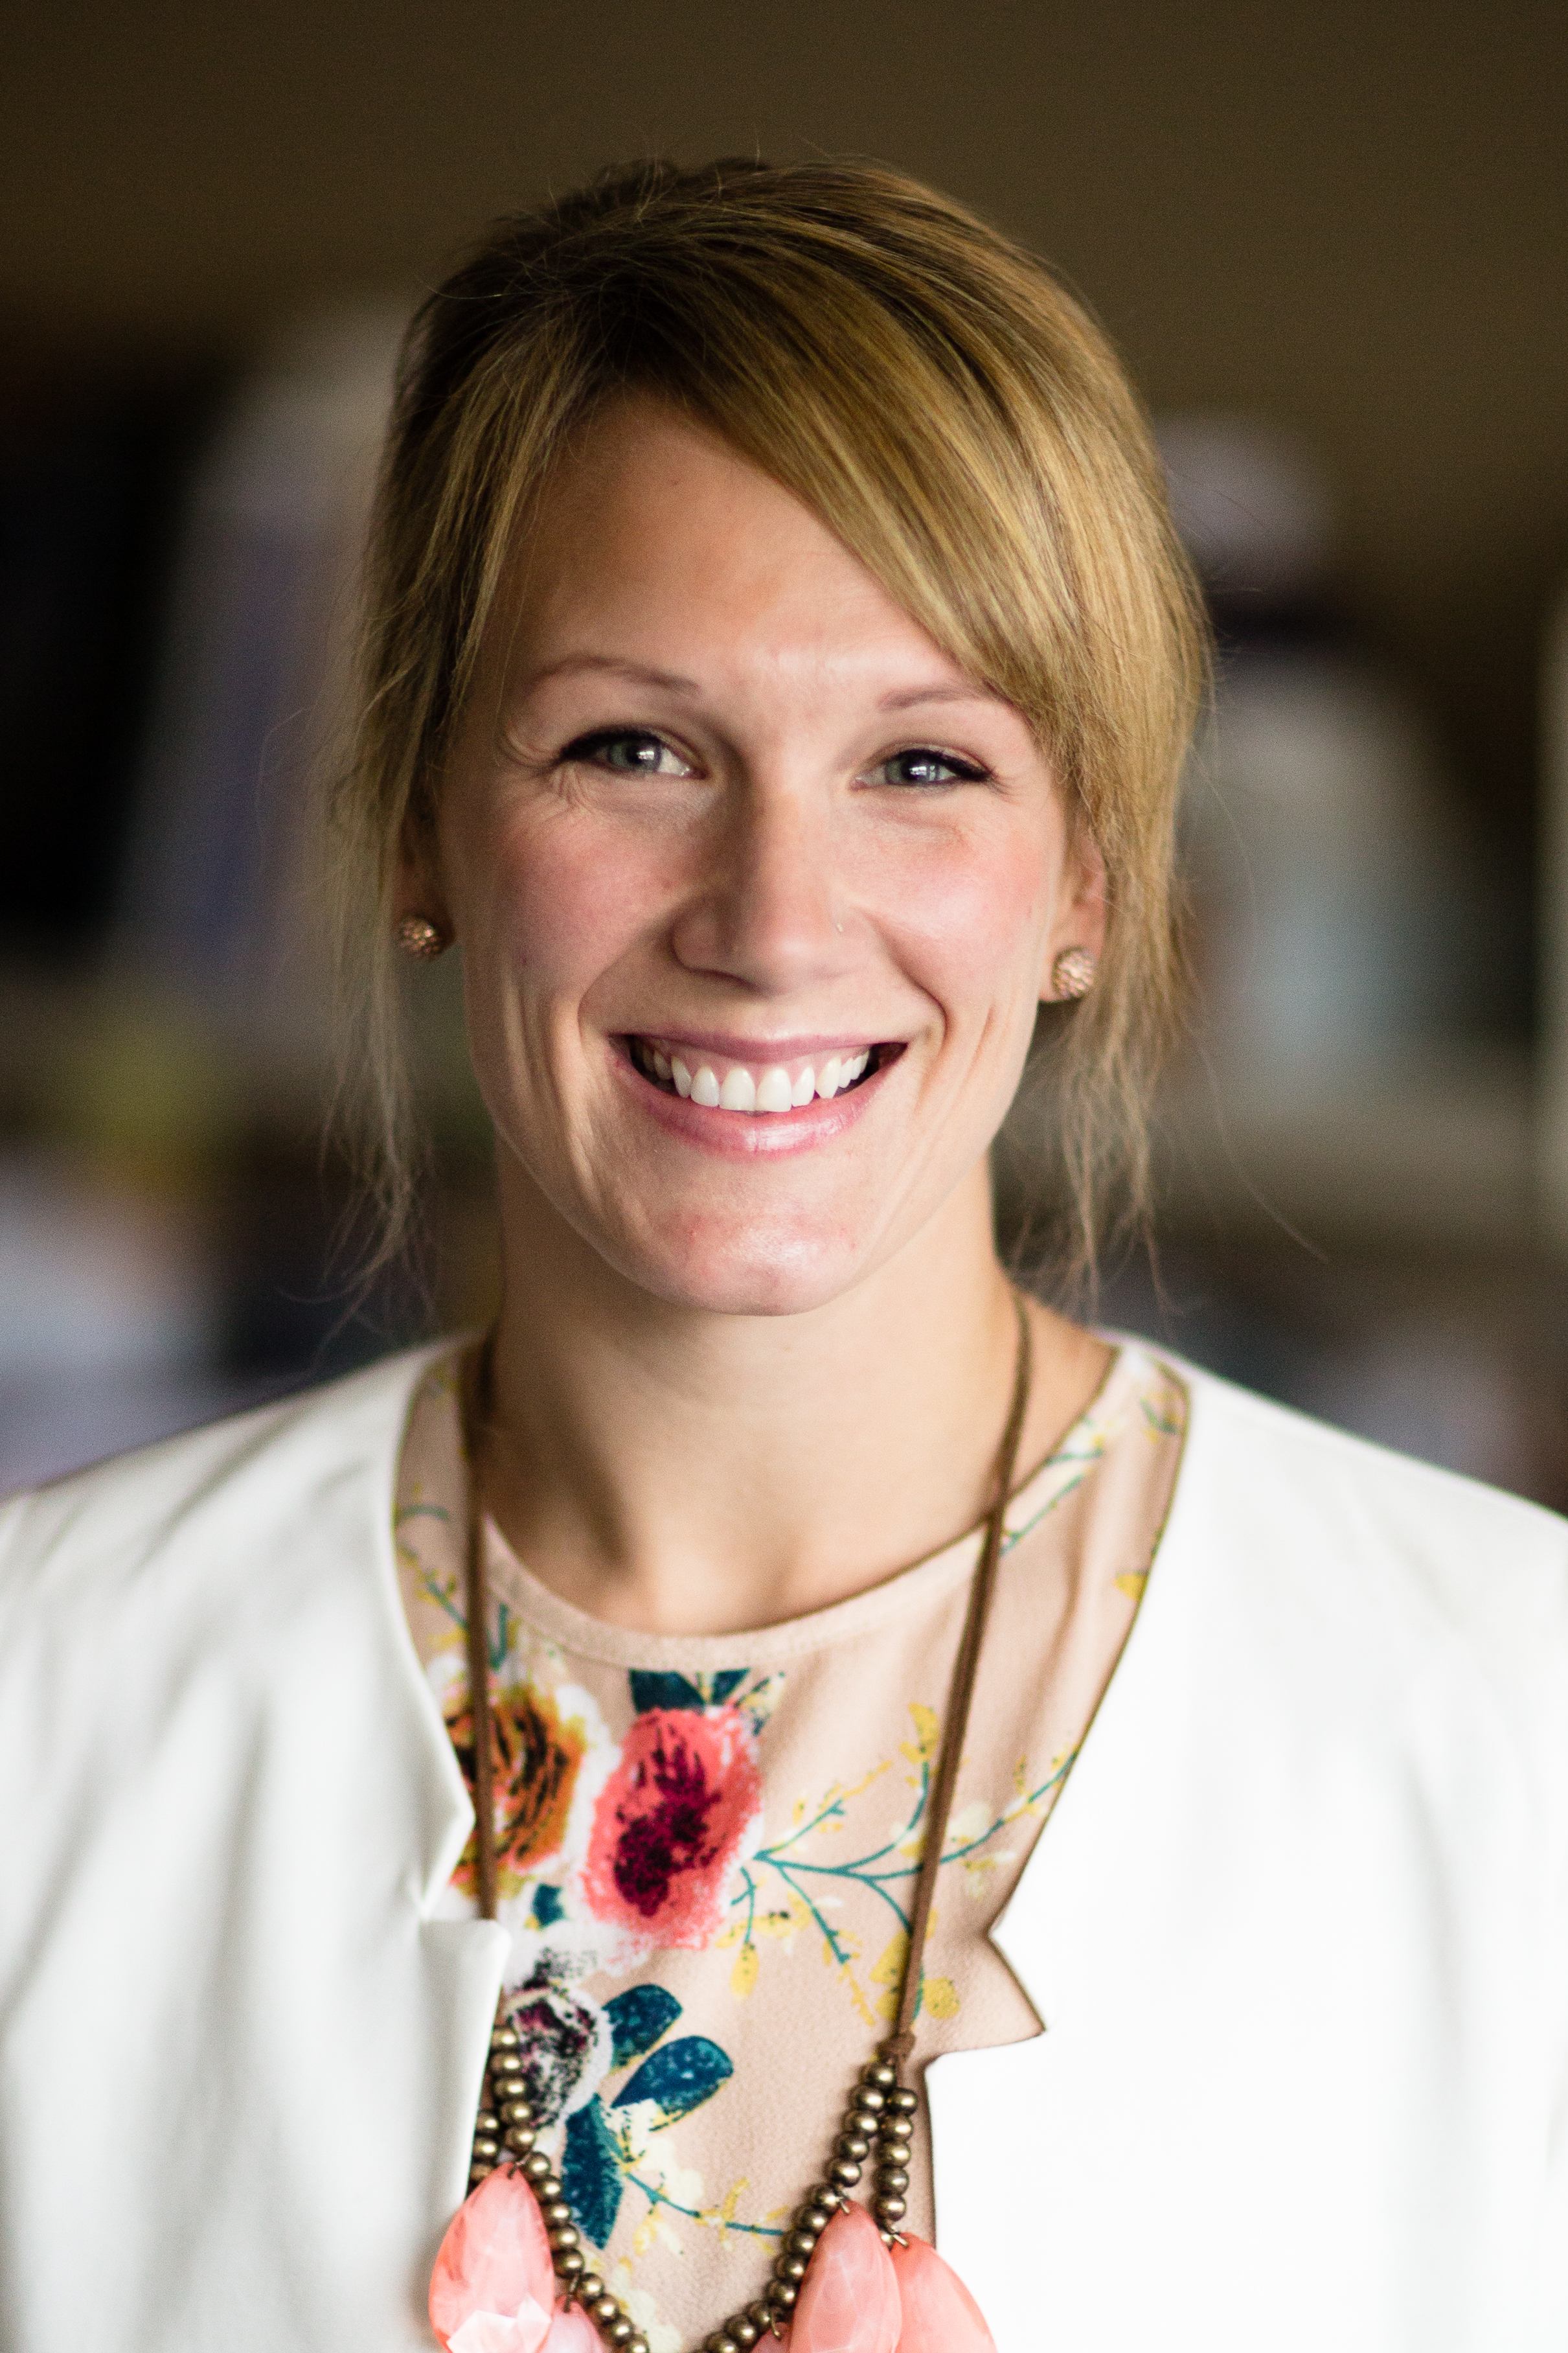 Dr. Emily Pietig, Dental Director